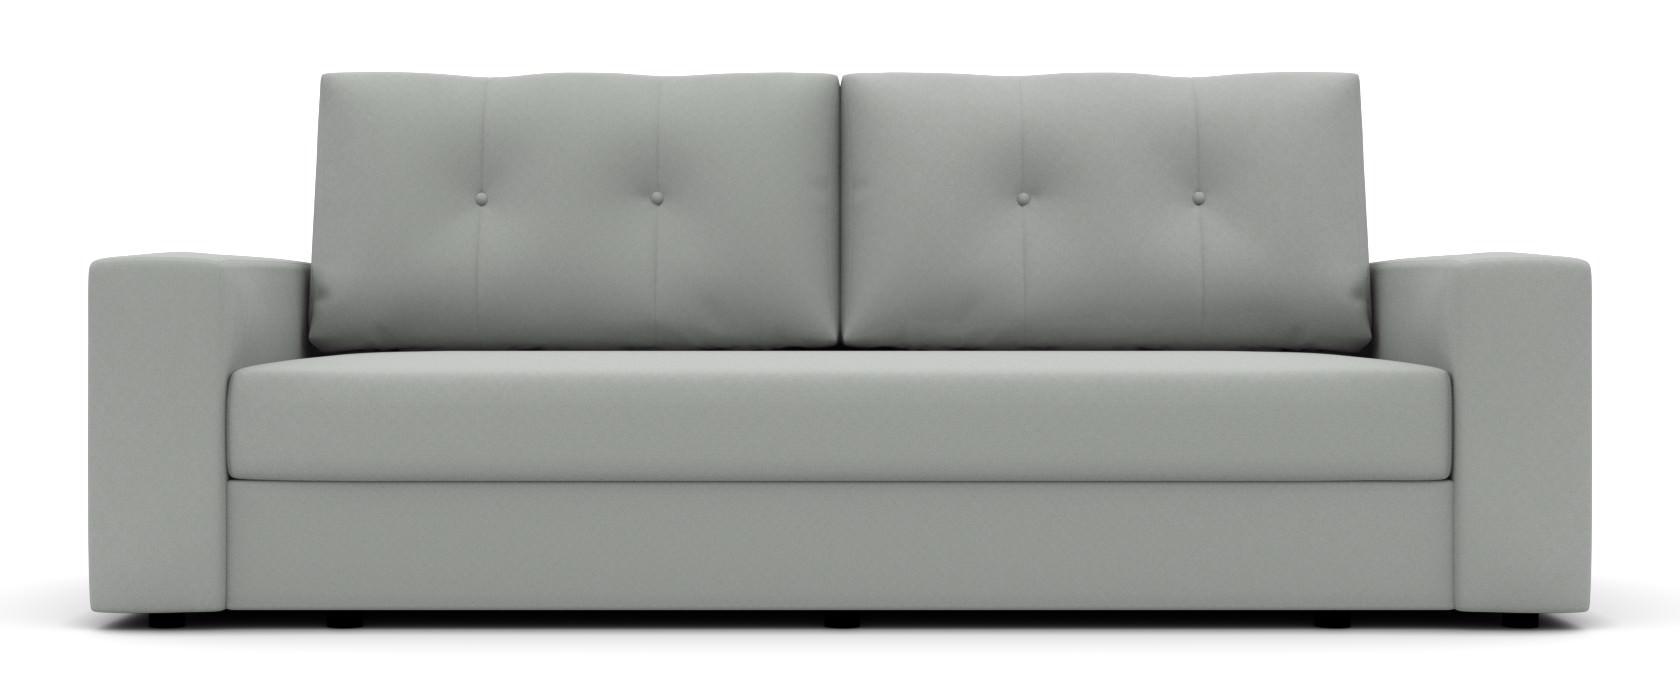 Трехместный диван Famiglia - Pufetto